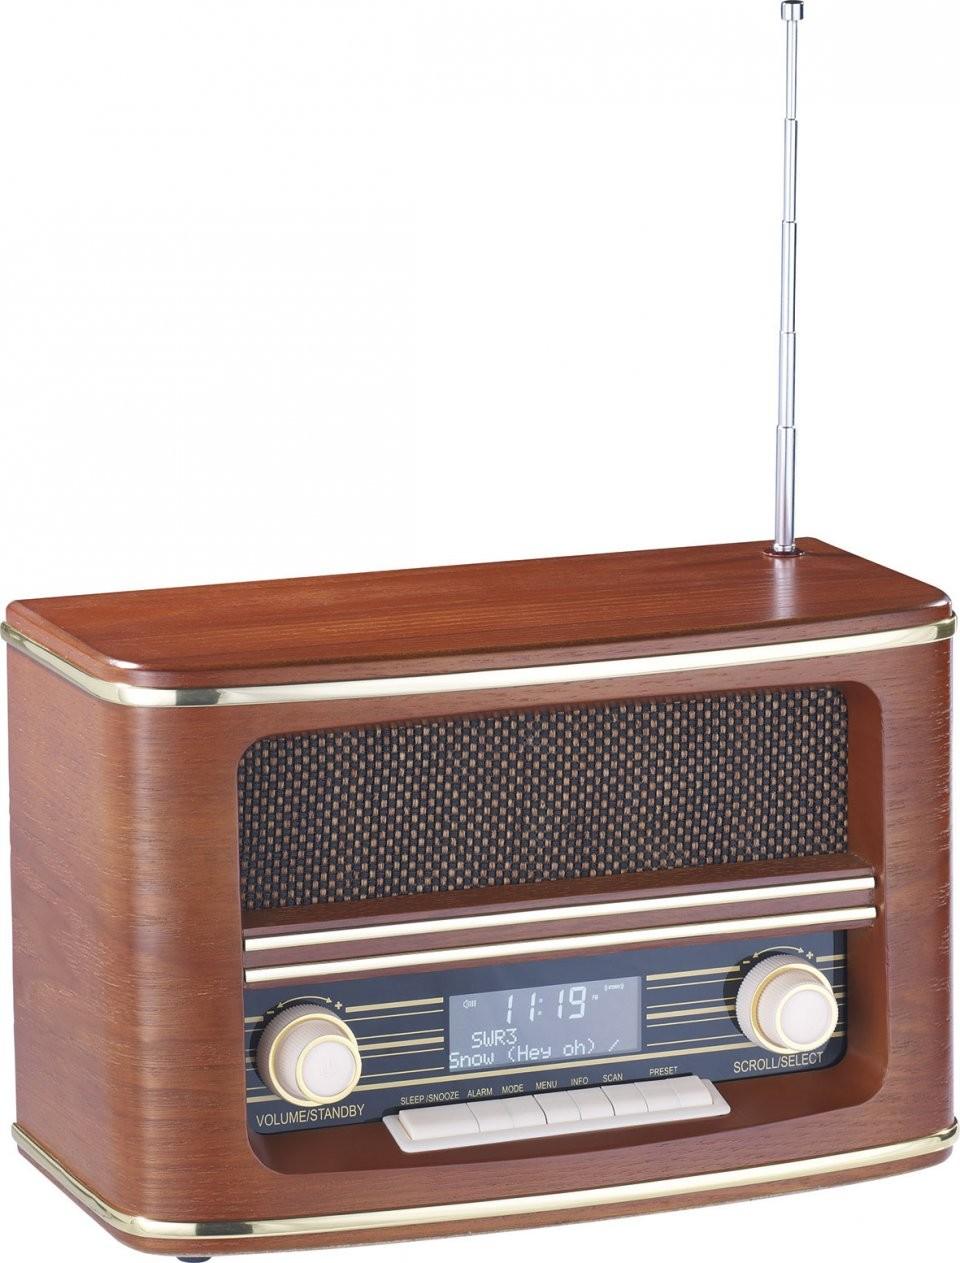 Radio de salle de bain design fabulous great nouveau for Radio salle de bain design